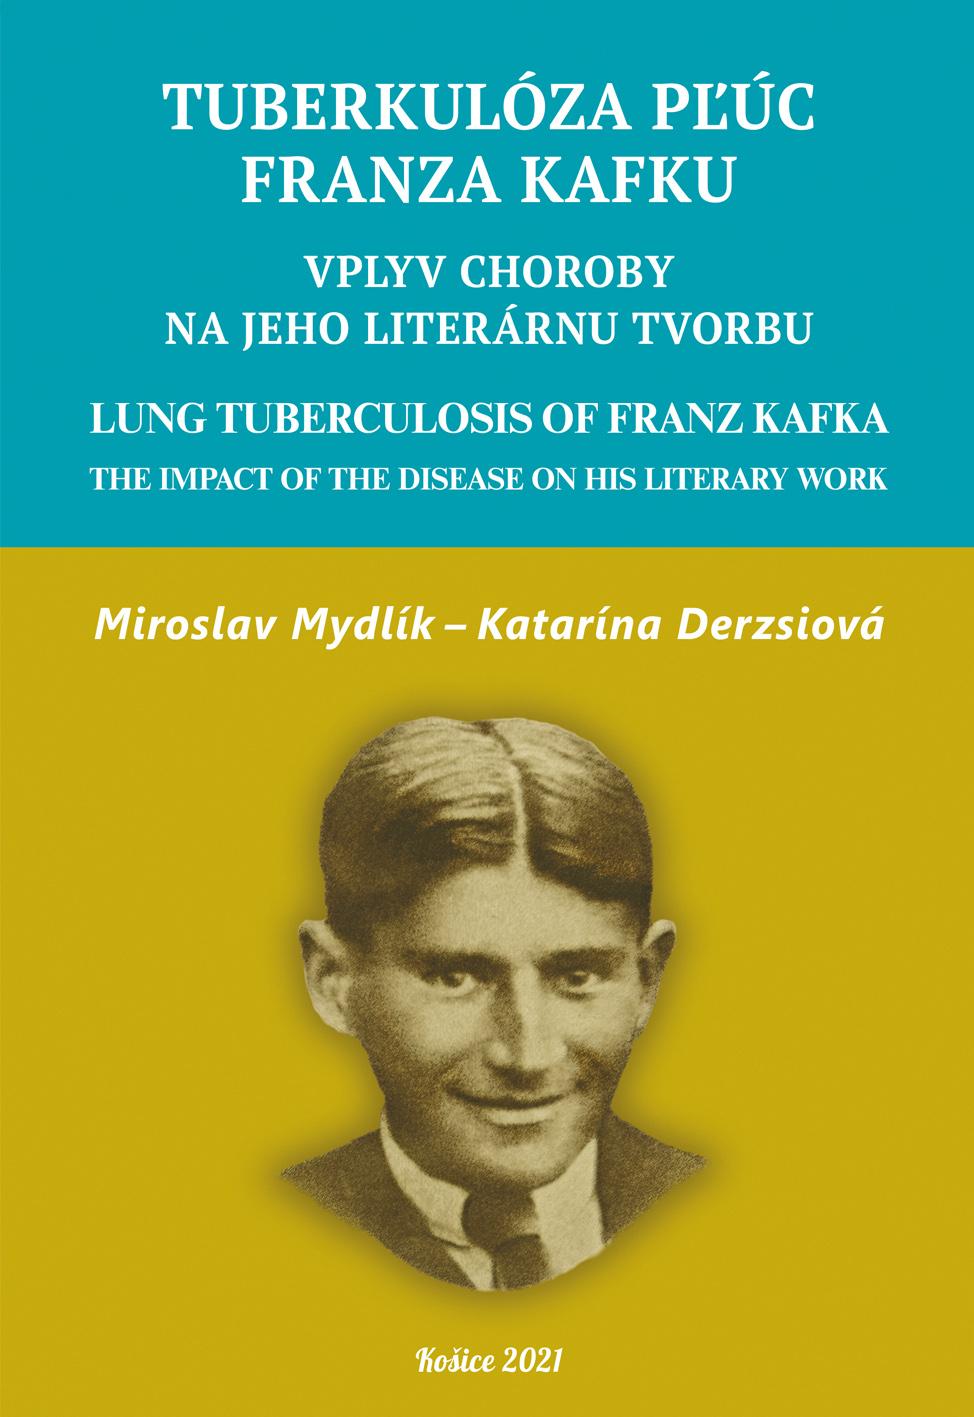 Tuberkulóza pľúc Franza Kafku. Lung Tuberculosis of Franz Kafka